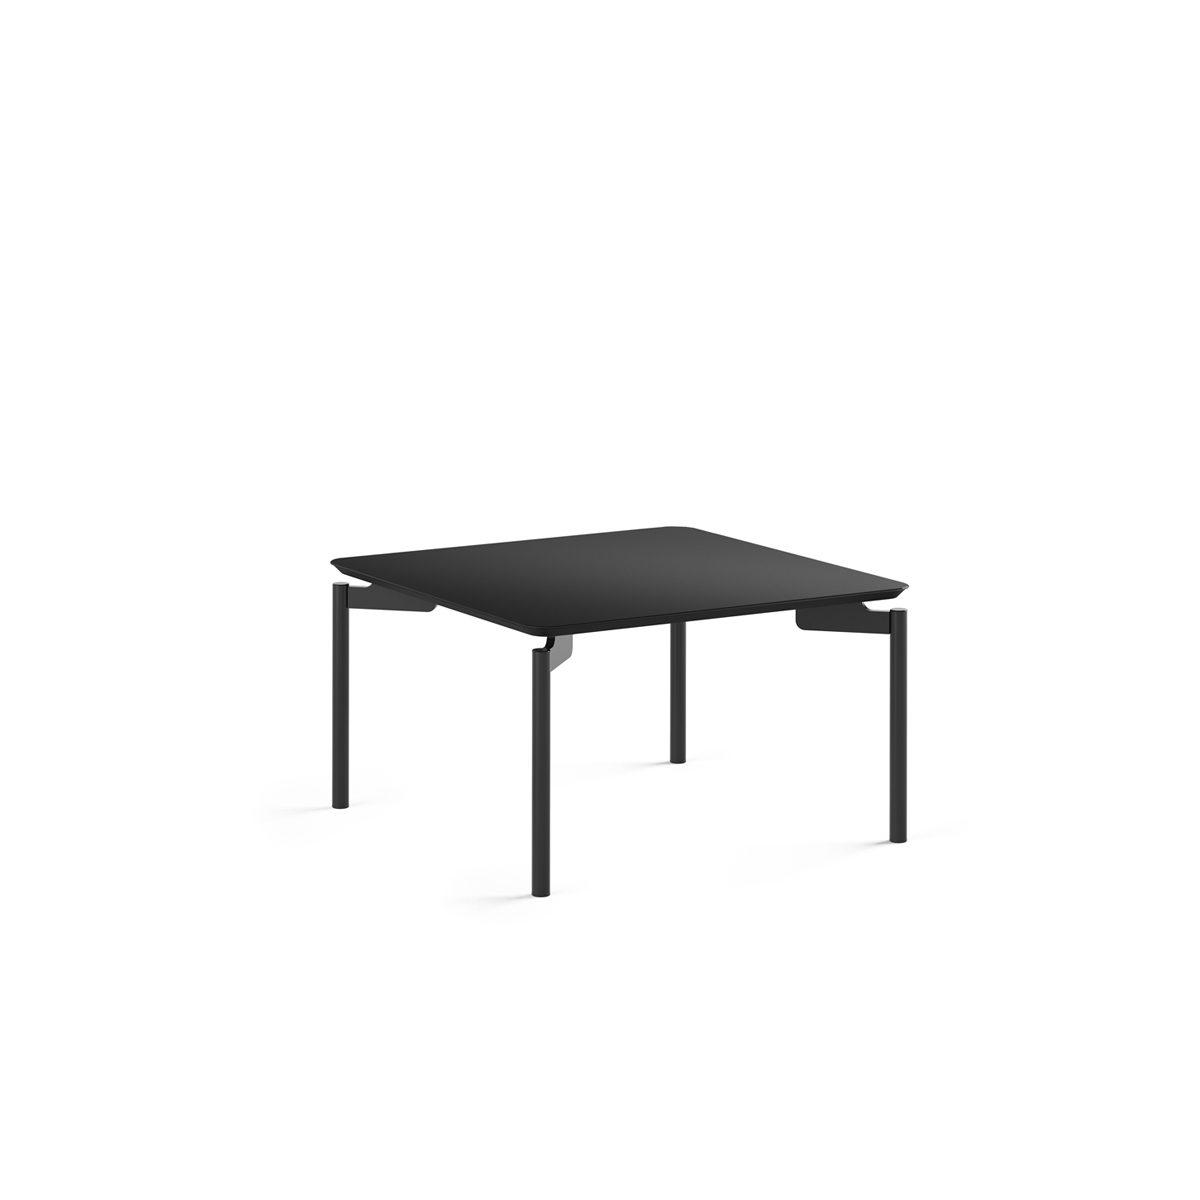 Mobile Coffee Table.Radius 1730 Square Nesting Coffee Table Bdi Furniture